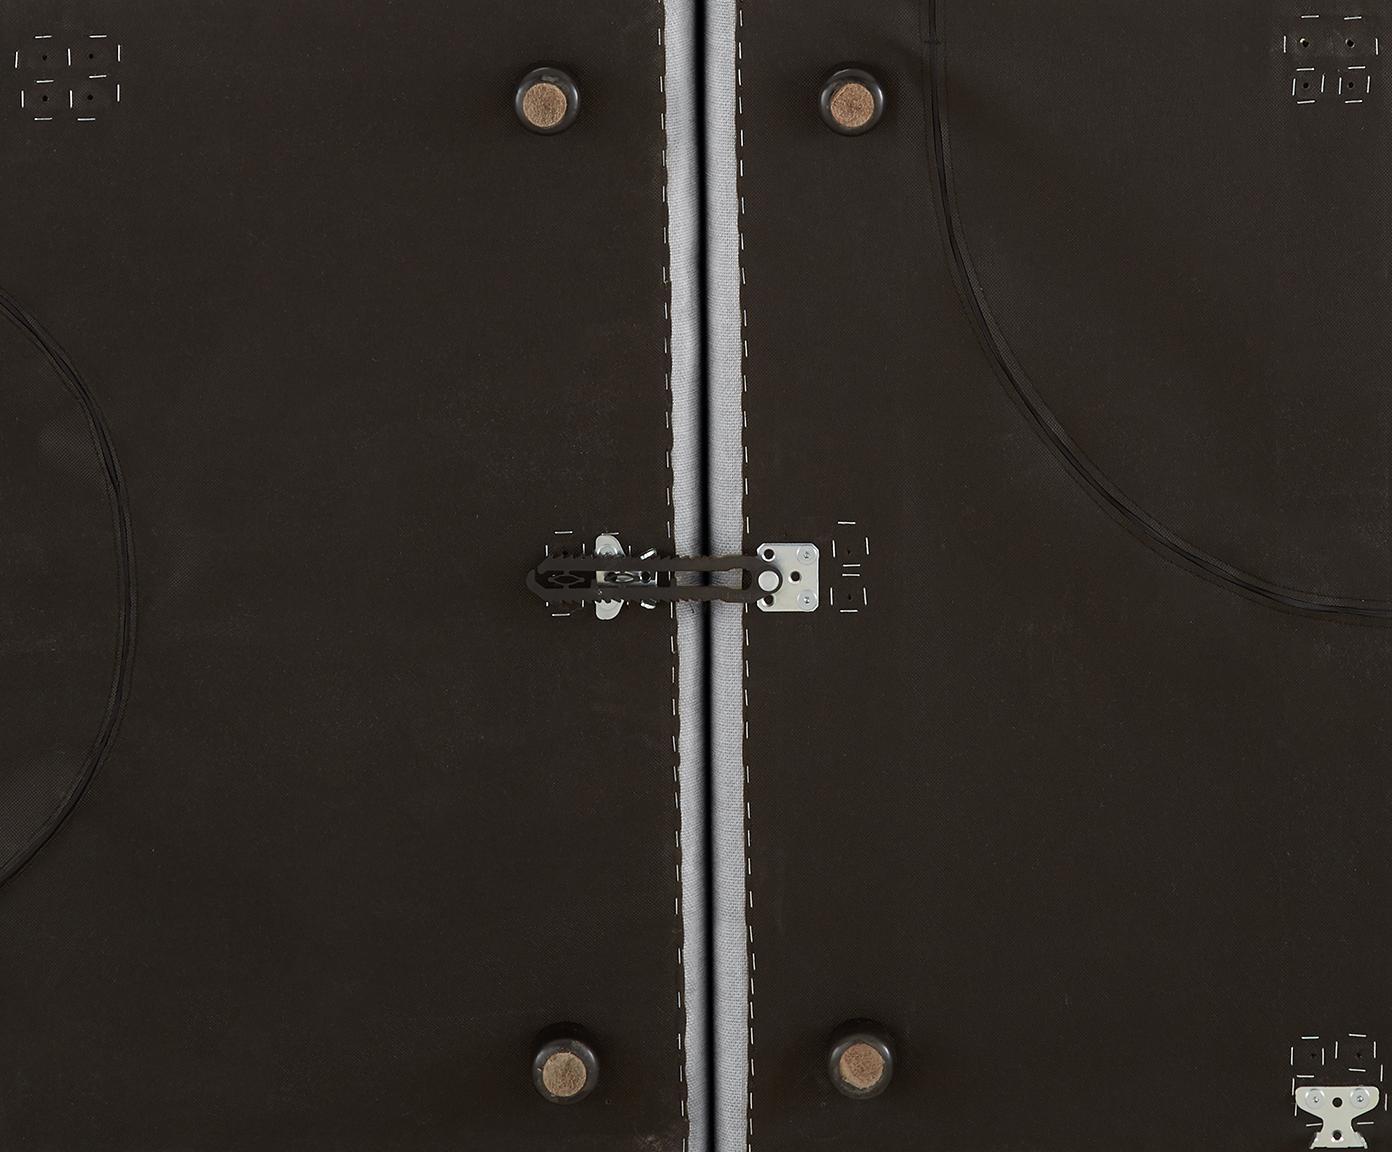 Modulare Ottomane Lennon, Bezug: Polyester Der hochwertige, Gestell: Massives Kiefernholz, Spe, Füße: Kunststoff, Webstoff Hellgrau, B 269 x T 119 cm